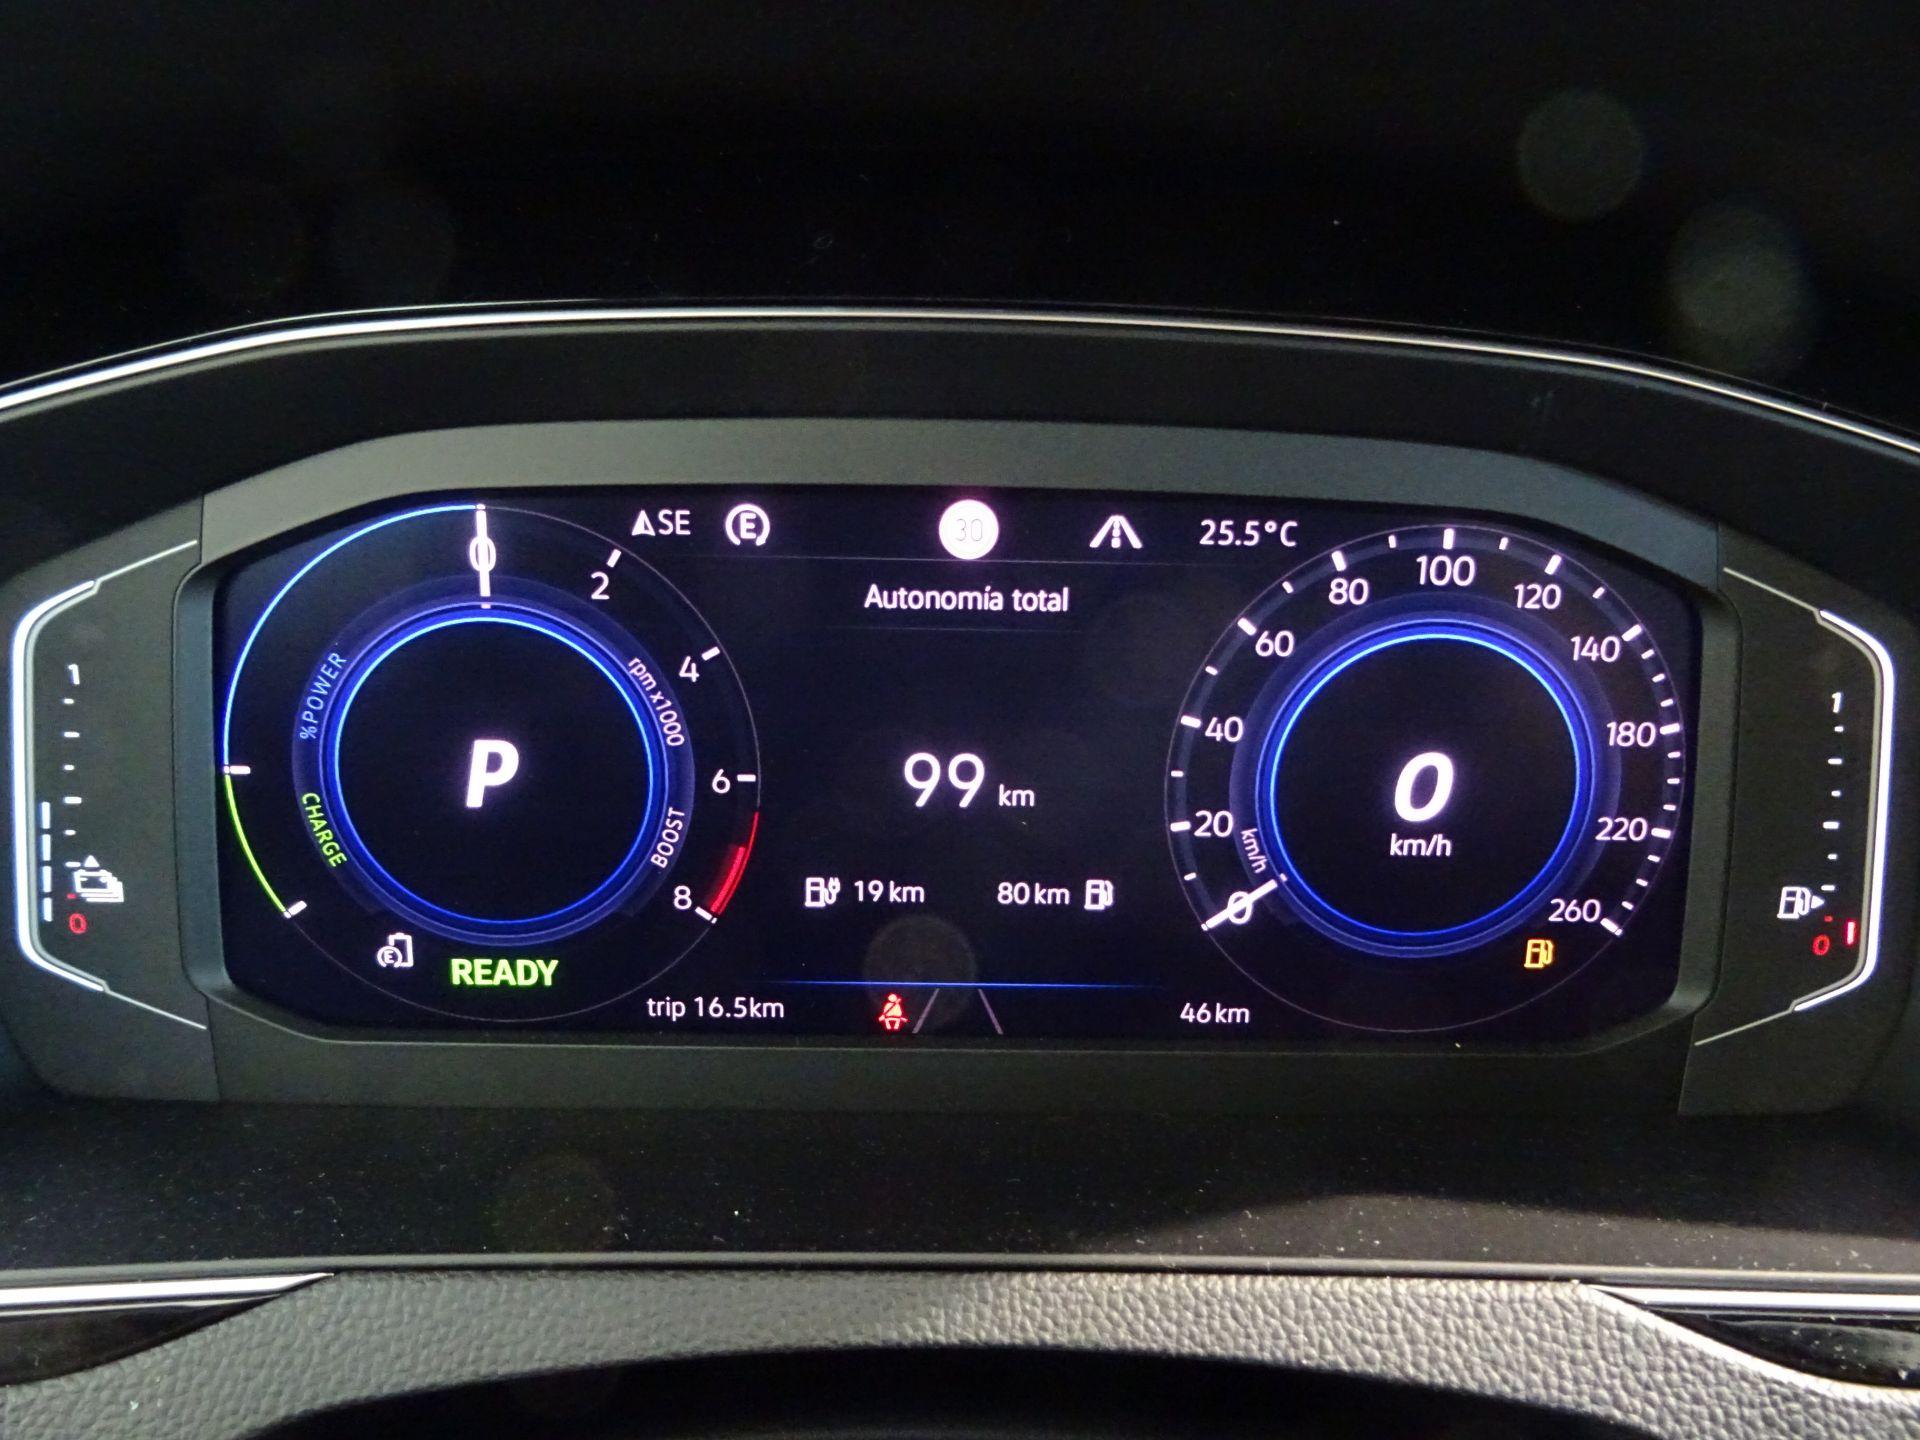 Volkswagen Passat GTE 1.4 TSI e-Power 115kW + 85kW DSG